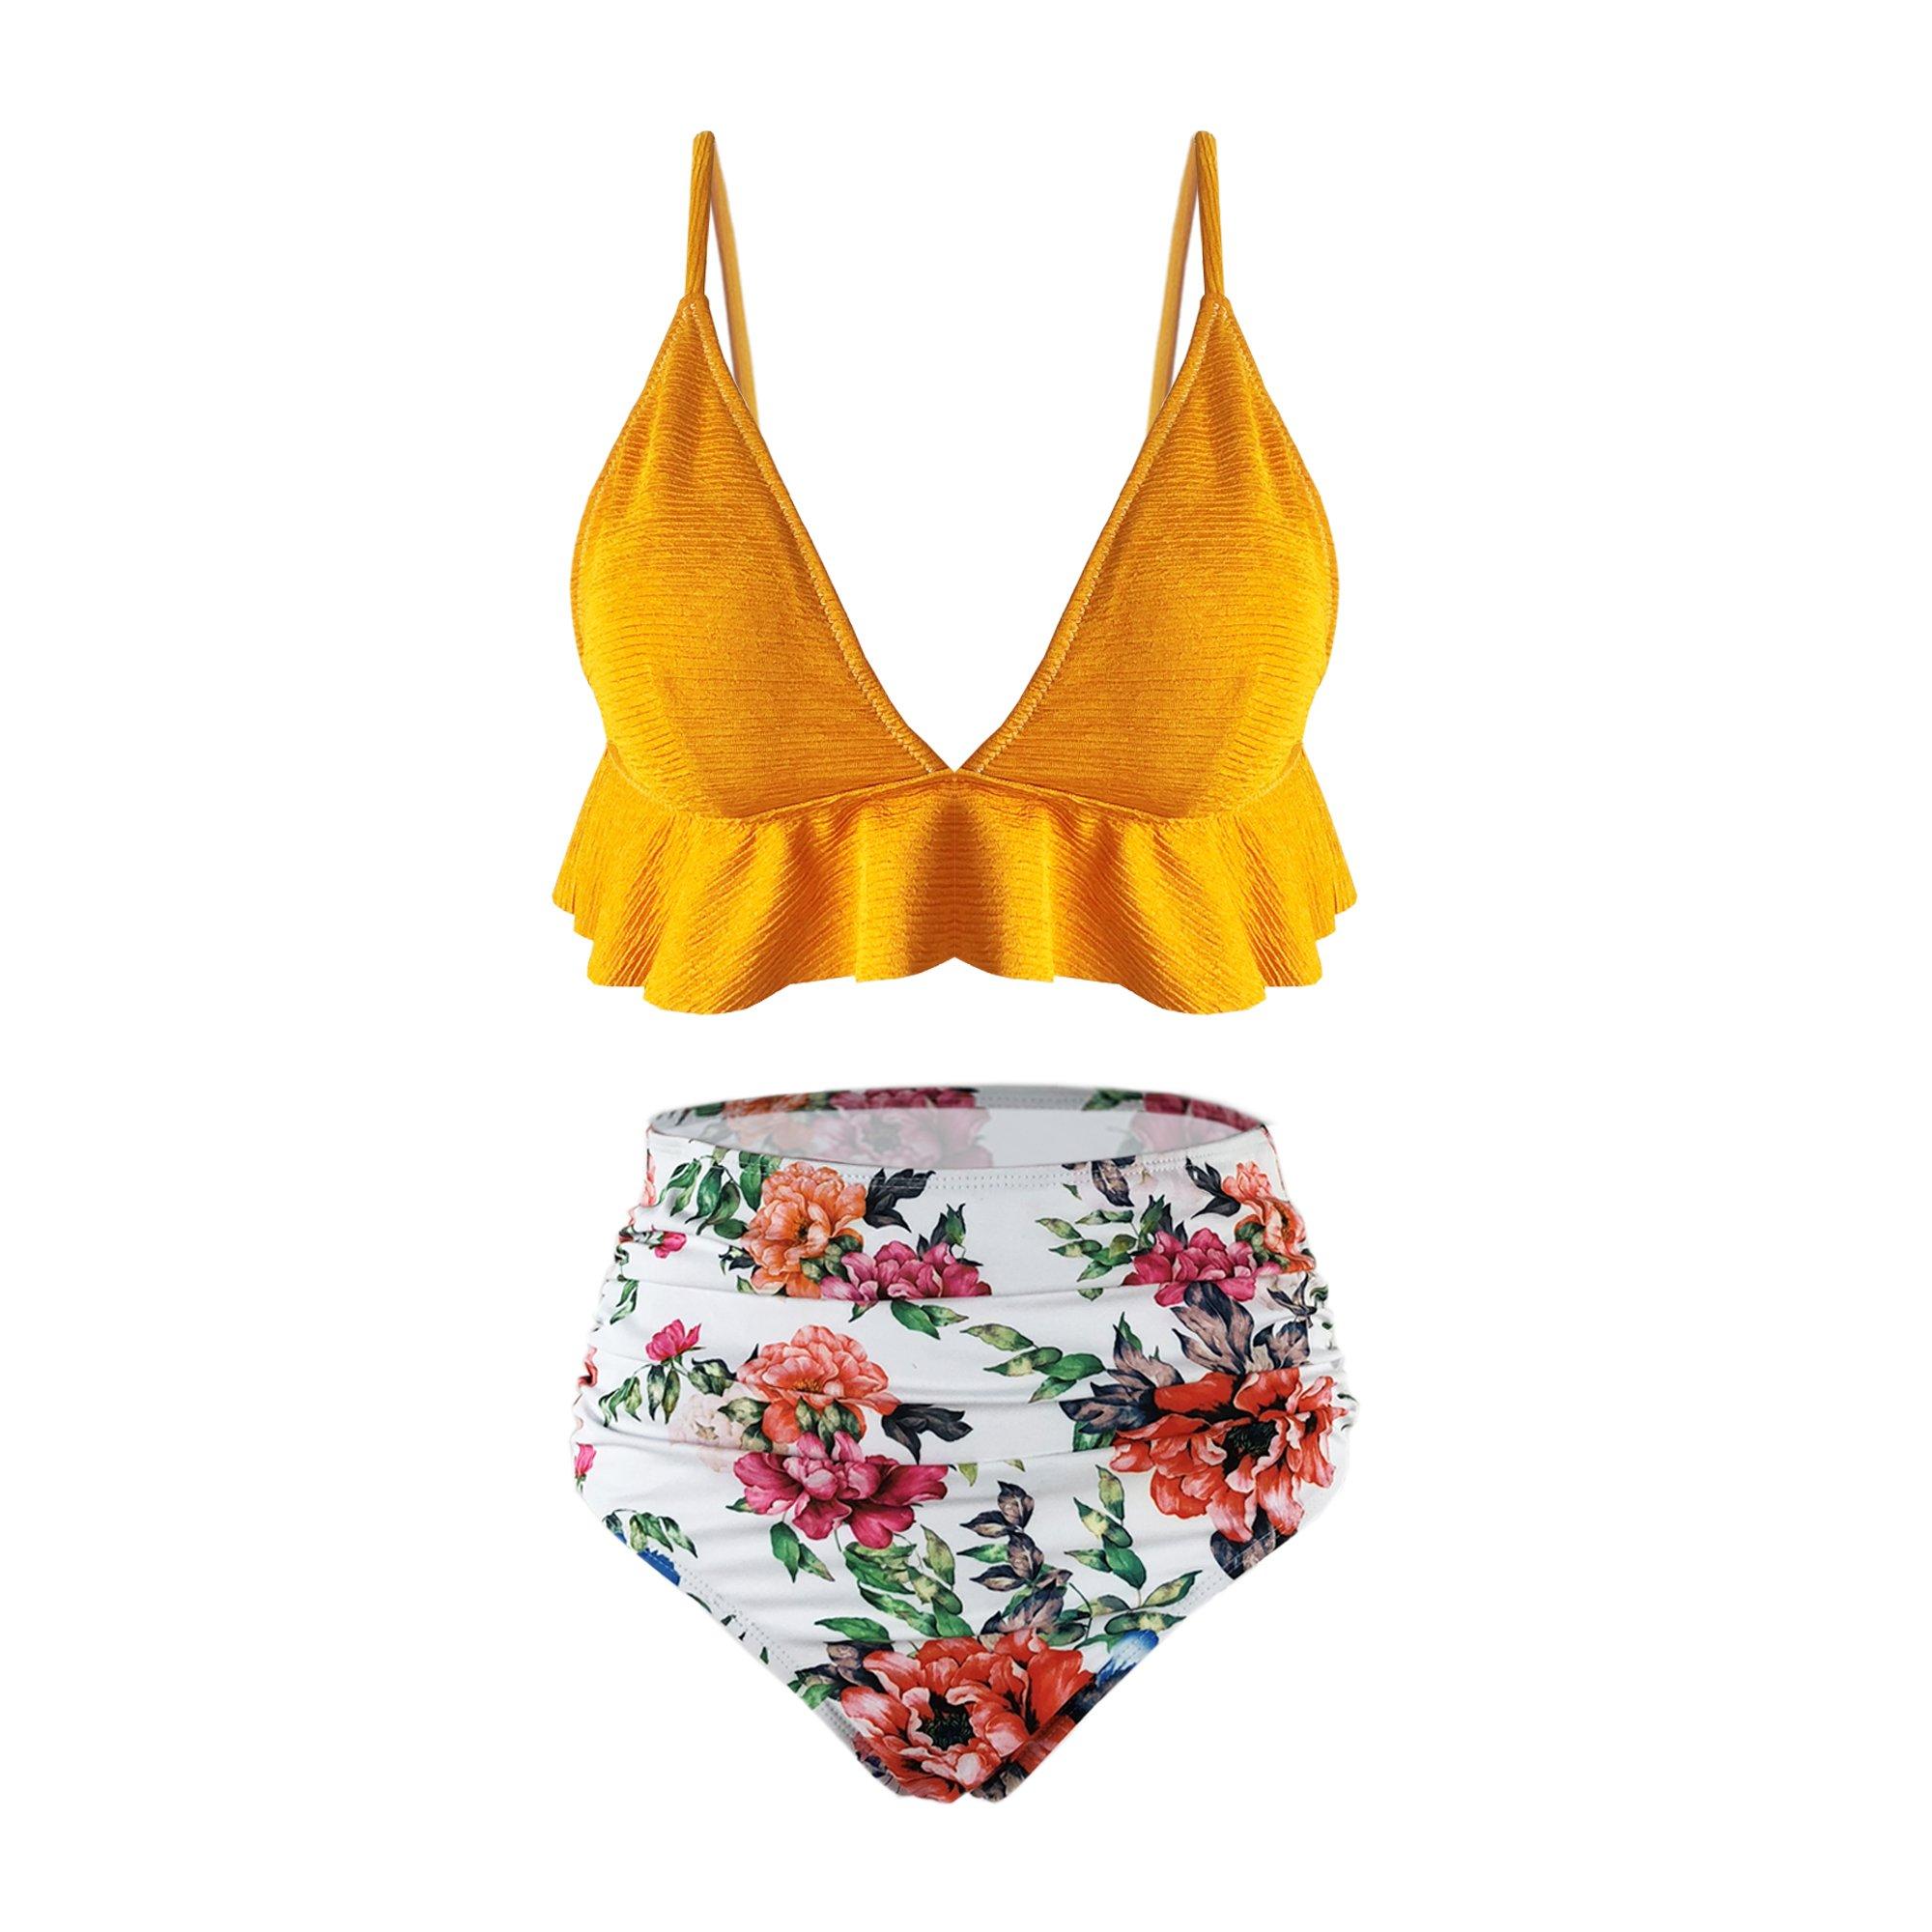 SS Queen Womens High Waisted Swimsuit Ruffle Print Bikini Swimwear Two Pieces Bathing Suit